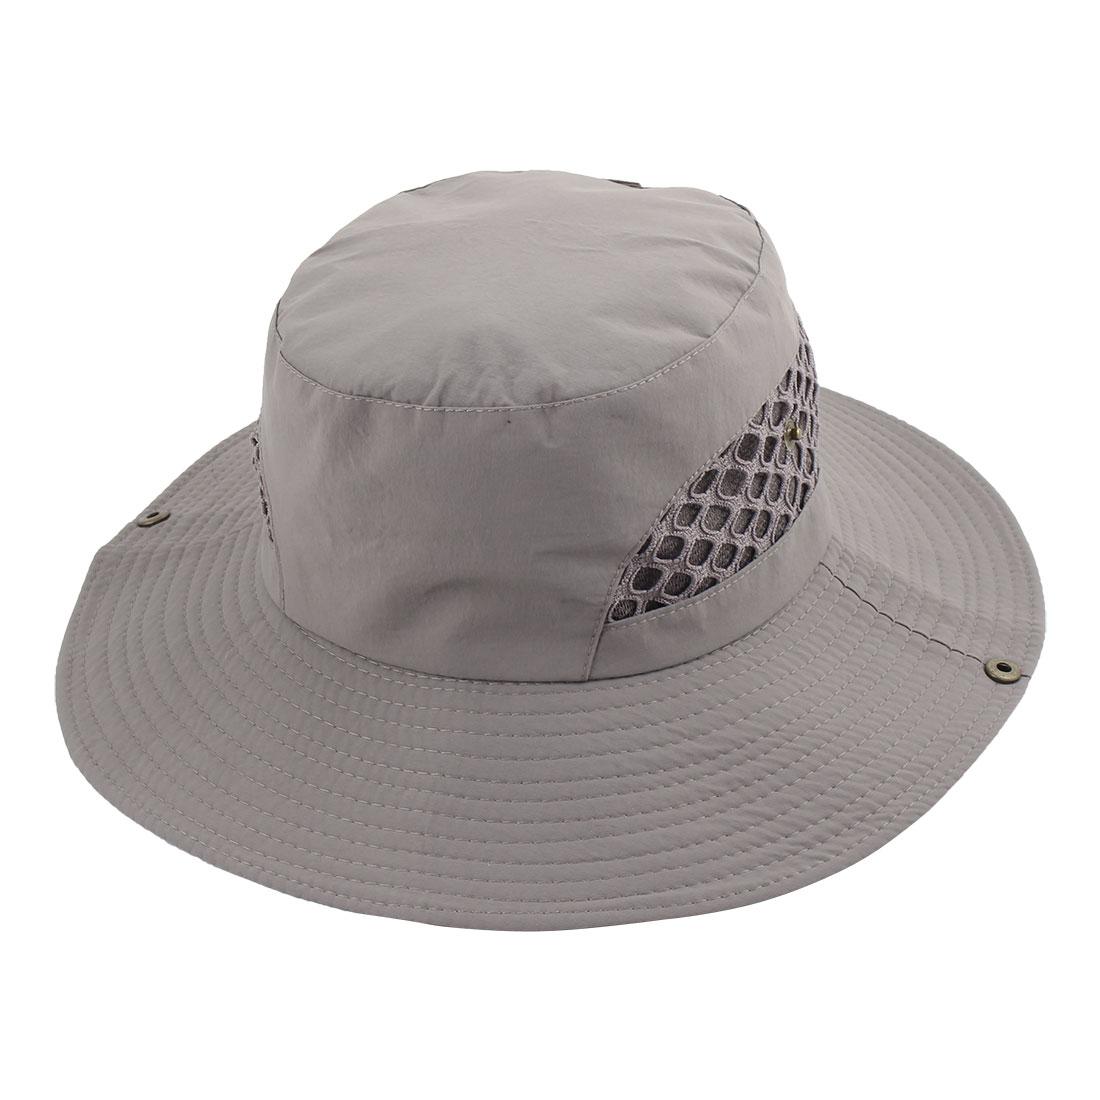 Fisherman Outdoor Fishing Hiking Travel Climbing Hunting Mesh Wide Brim Cap Headwear Sun Bucket Hat Light Gray